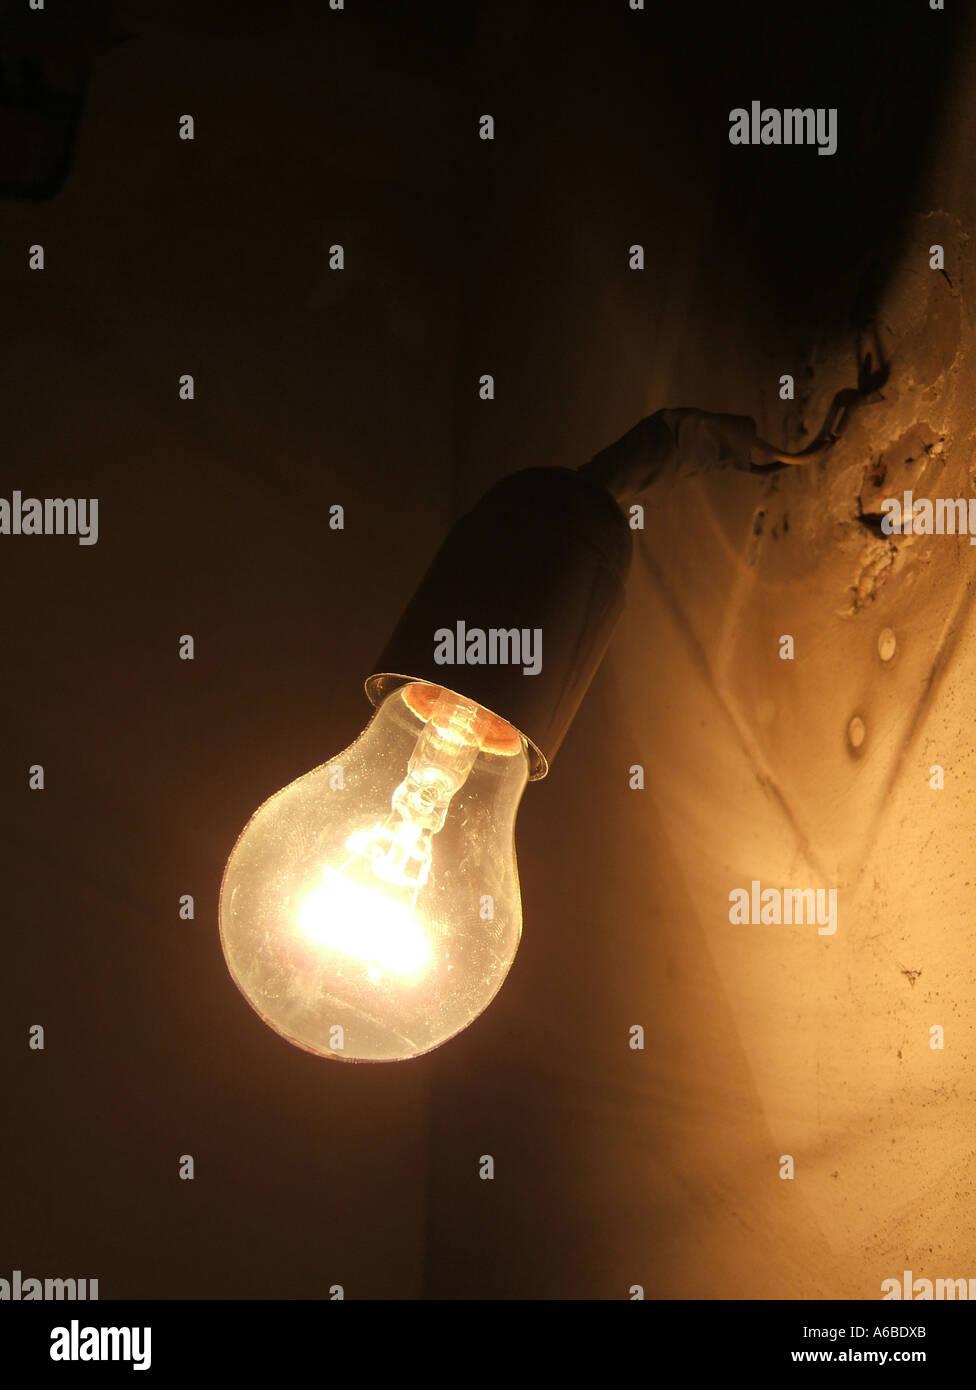 Dark room with light bulb - Stock Photo One Bare Light Bulb In Dark Room